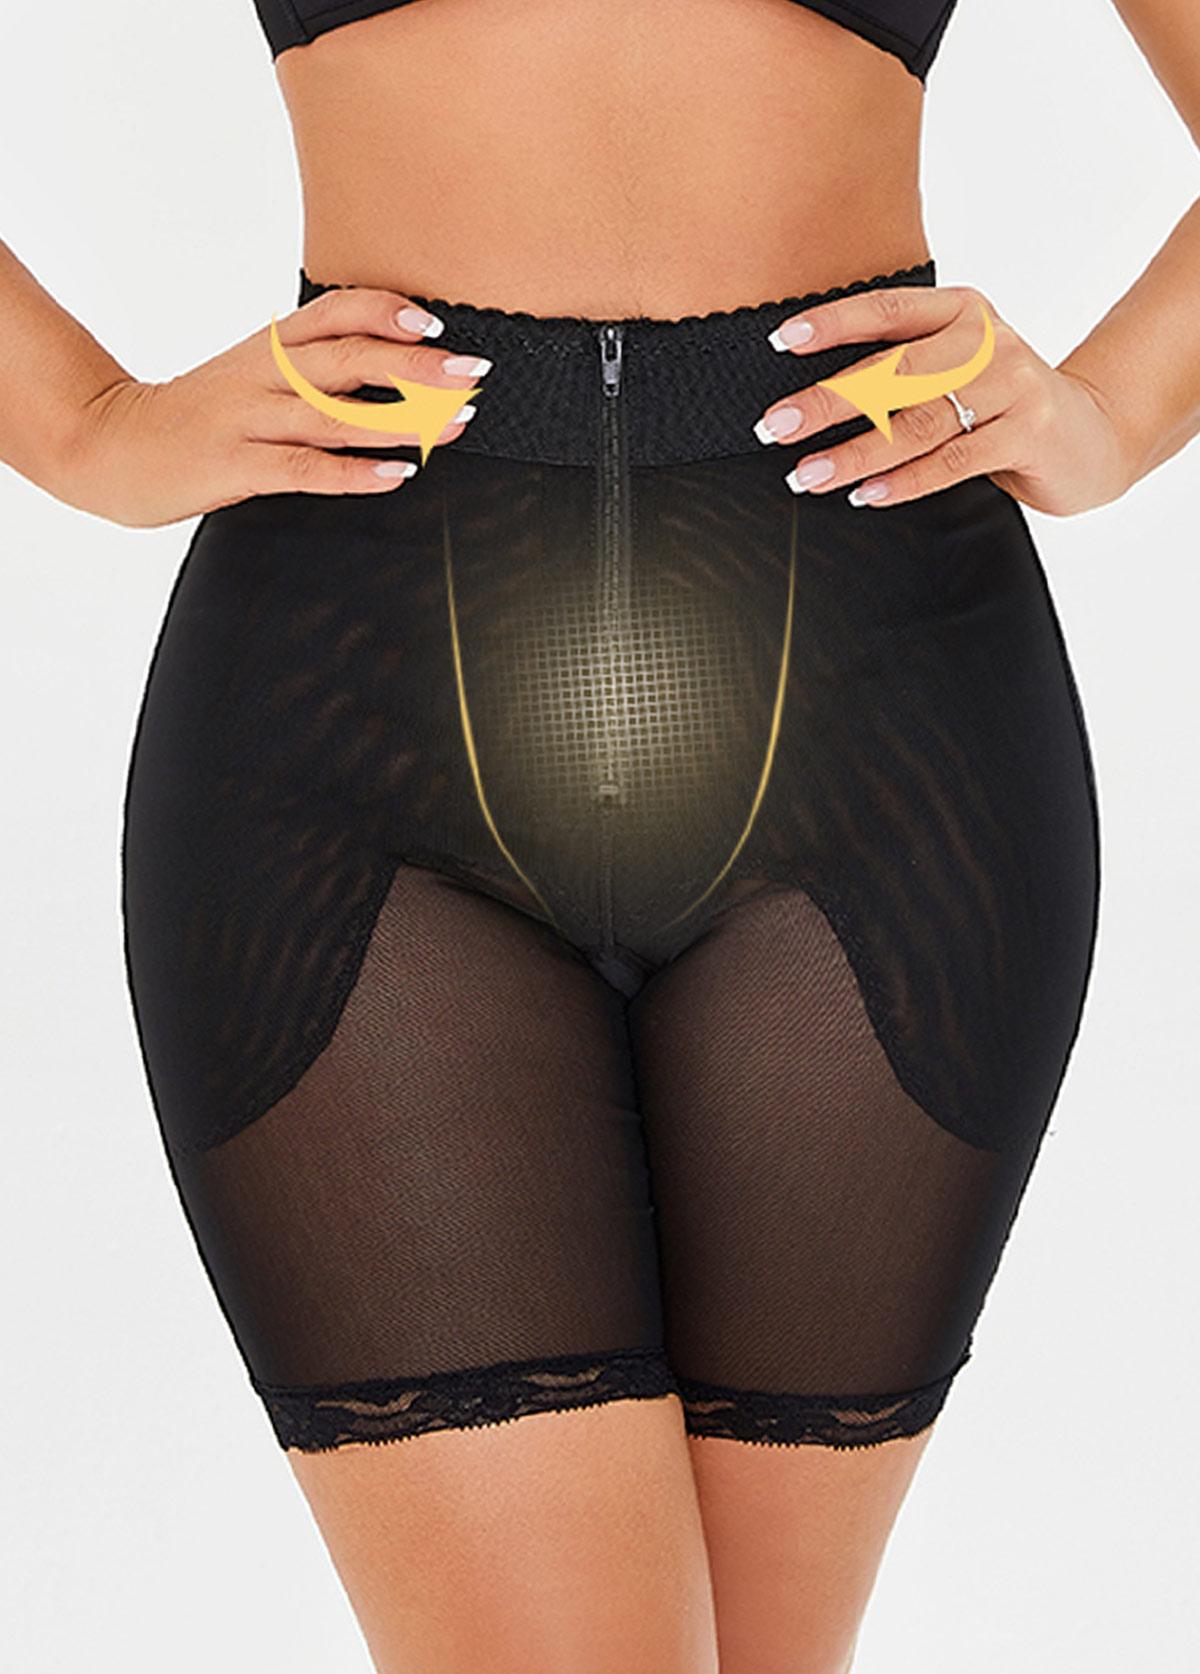 High Waist Black Semi Sheer Panties